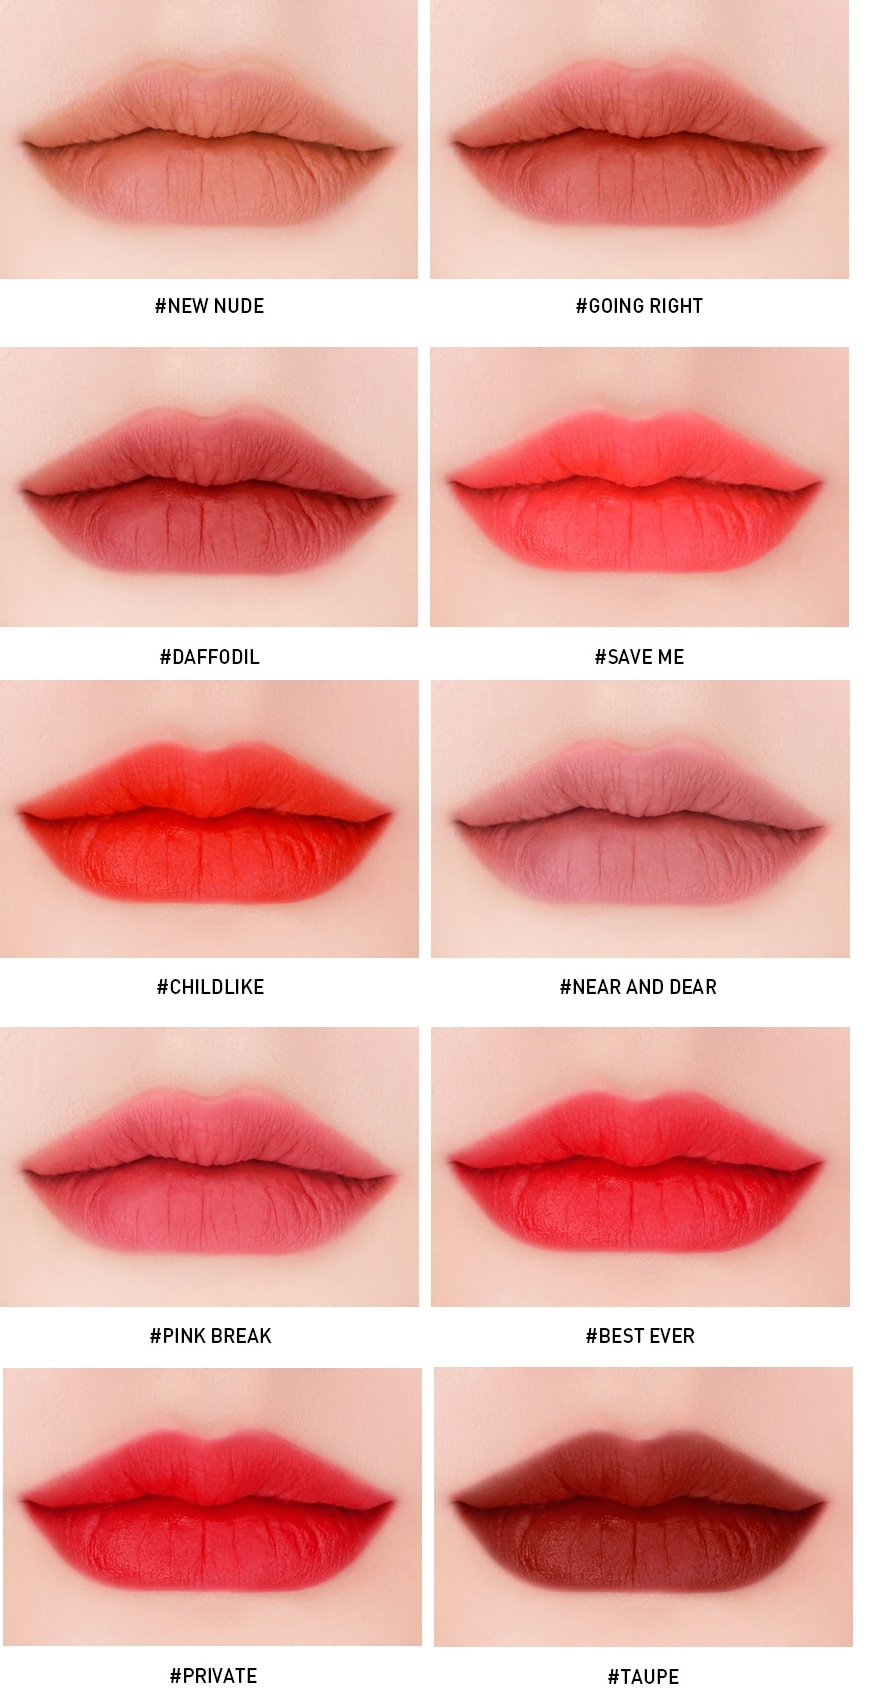 Son kem lì 3CE Velvet Lip Tint với 10 màu son cực hot